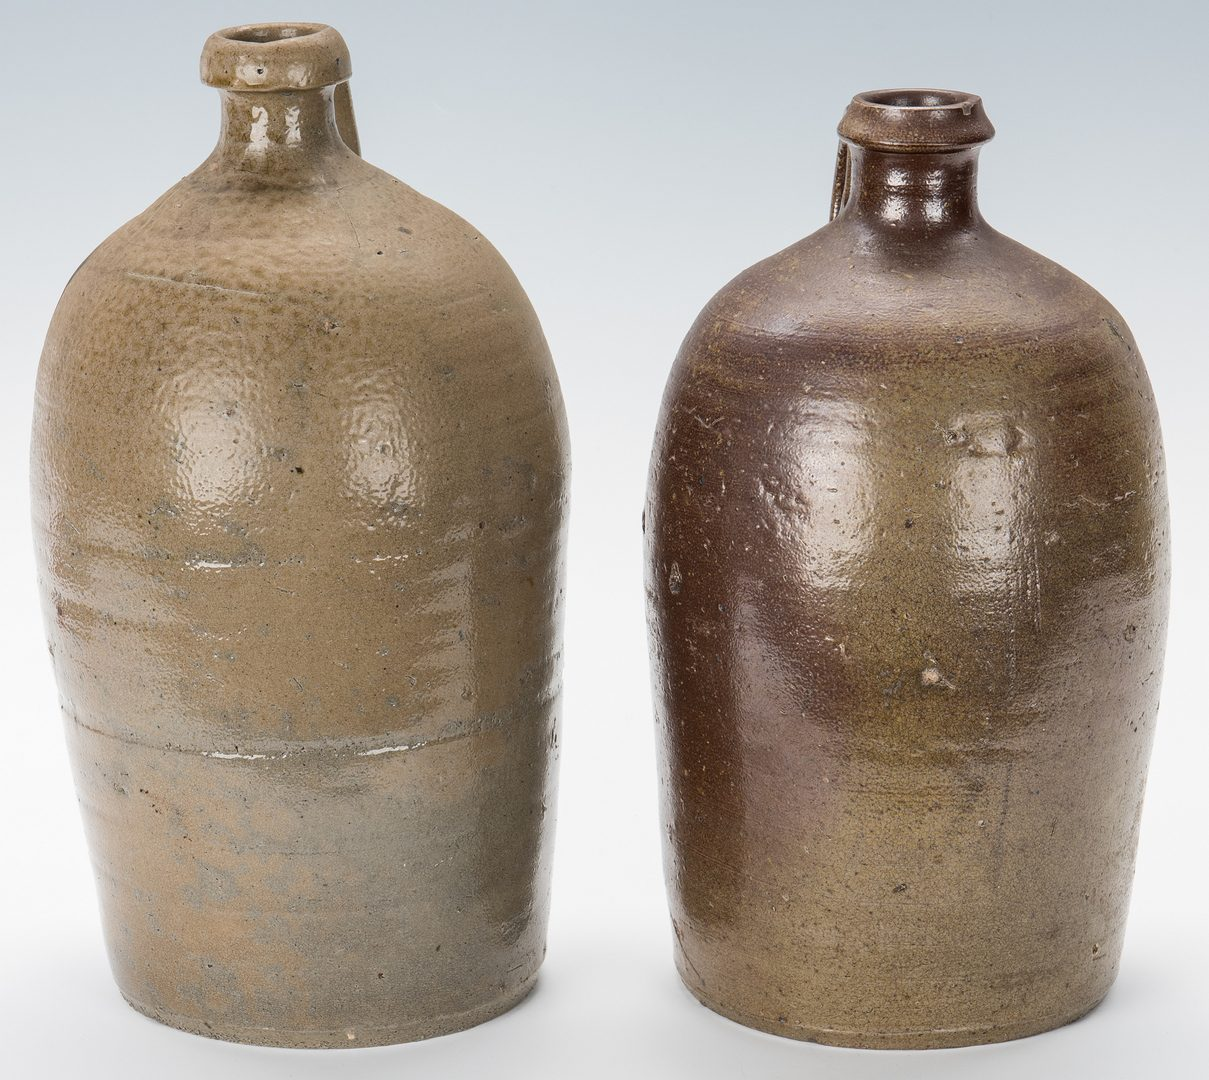 Lot 128: 4 NC Randolph County Stoneware Pottery Jugs